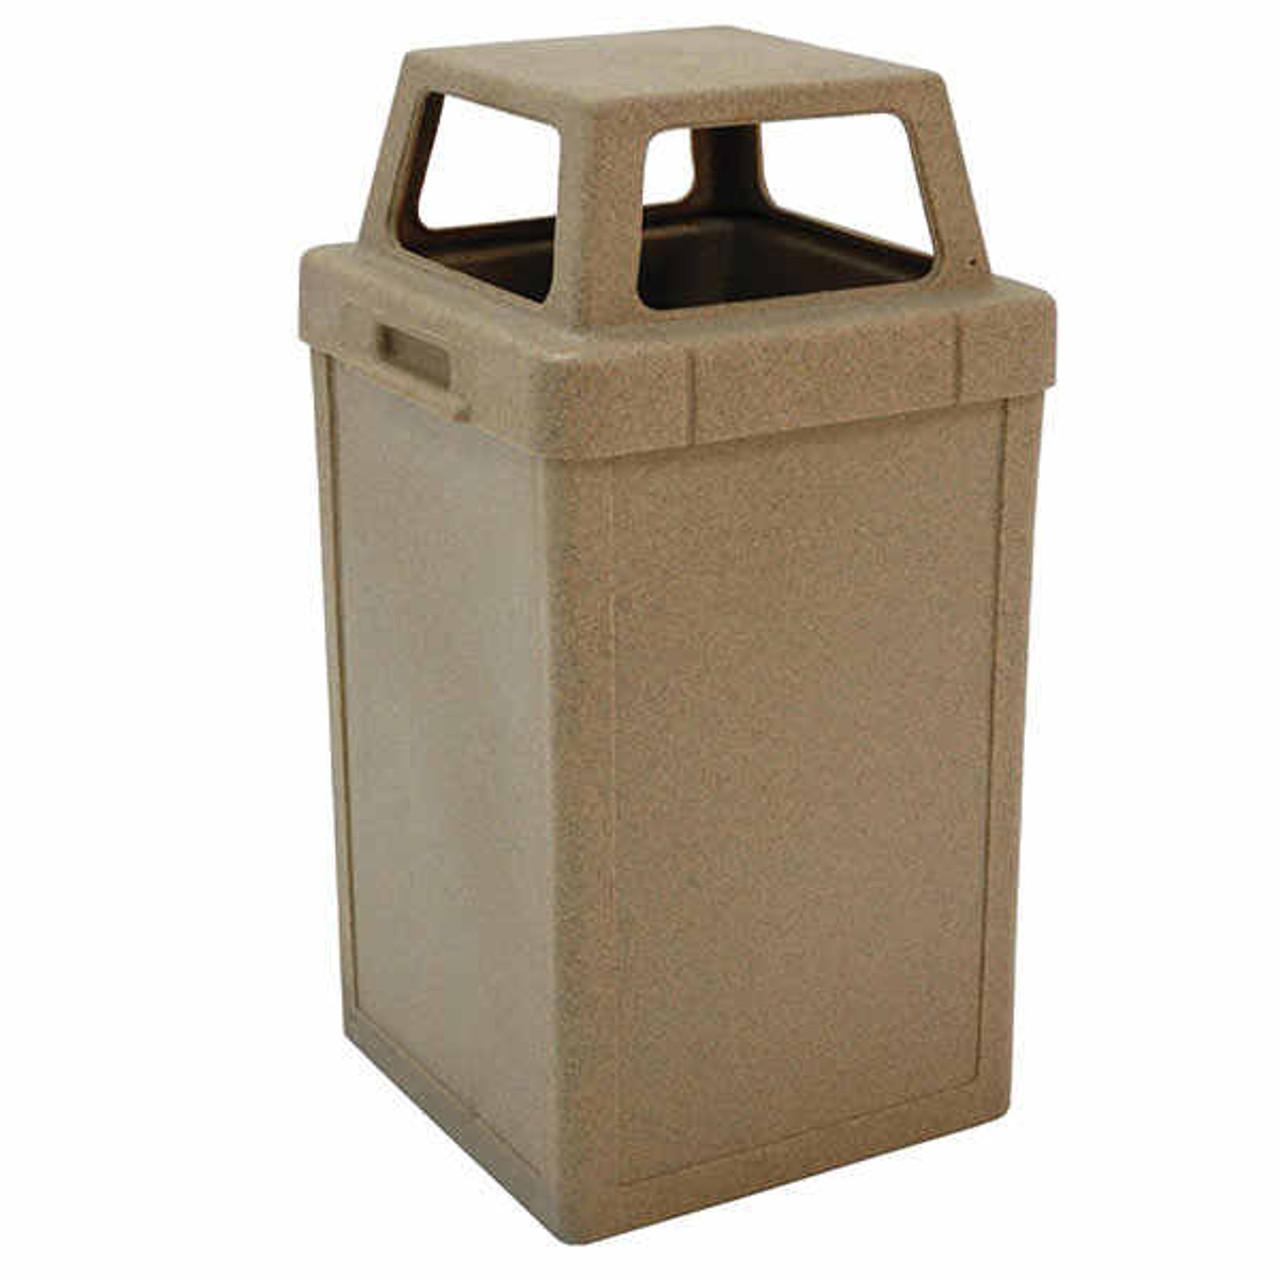 24 Gallon Heavy Duty Plastic Indoor Outdoor Waste Container TF1019